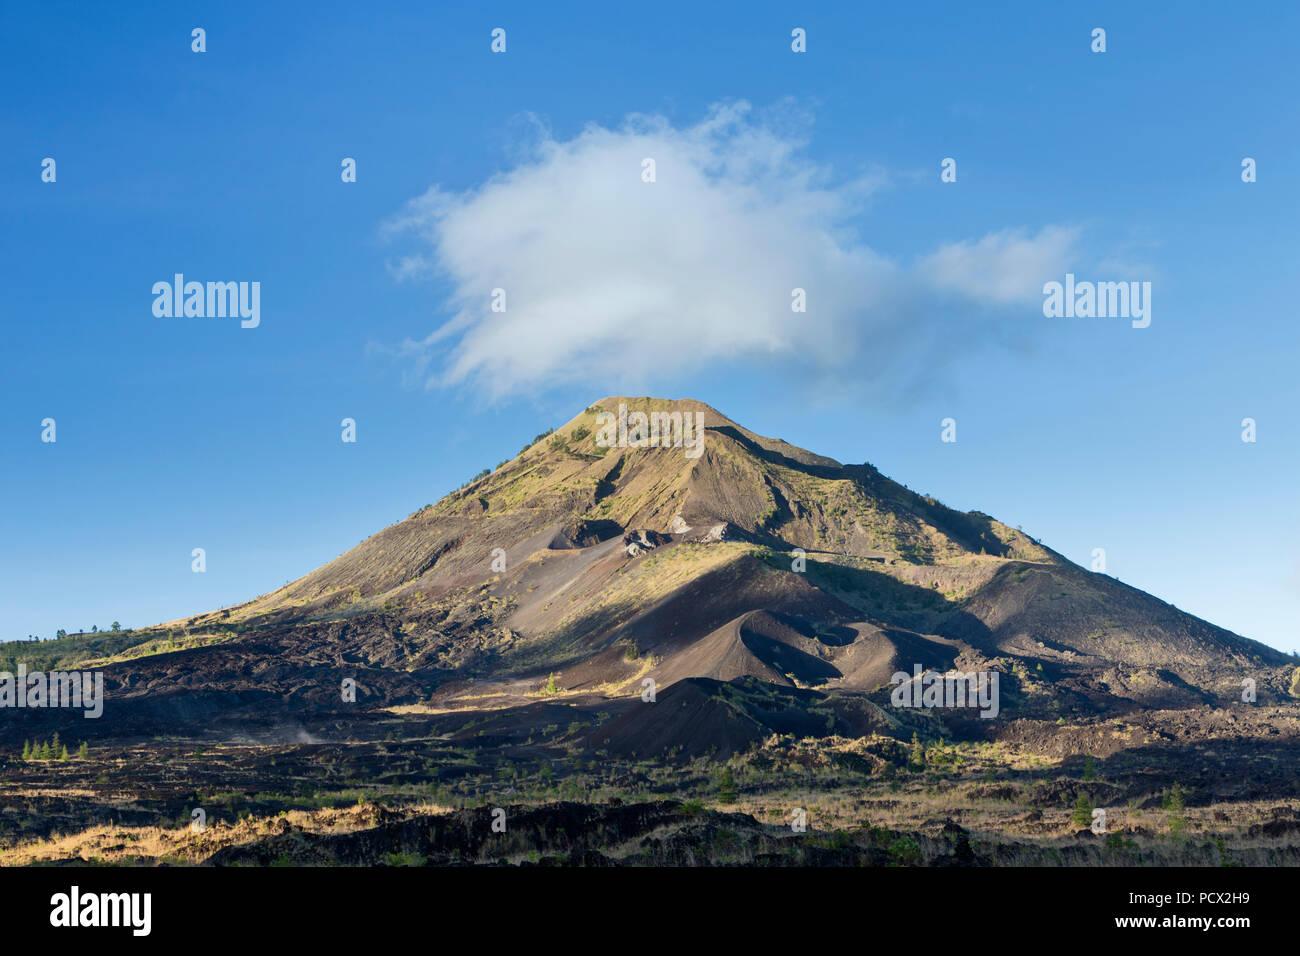 Gunung Batur volcano, Bali, Indonesia - Stock Image